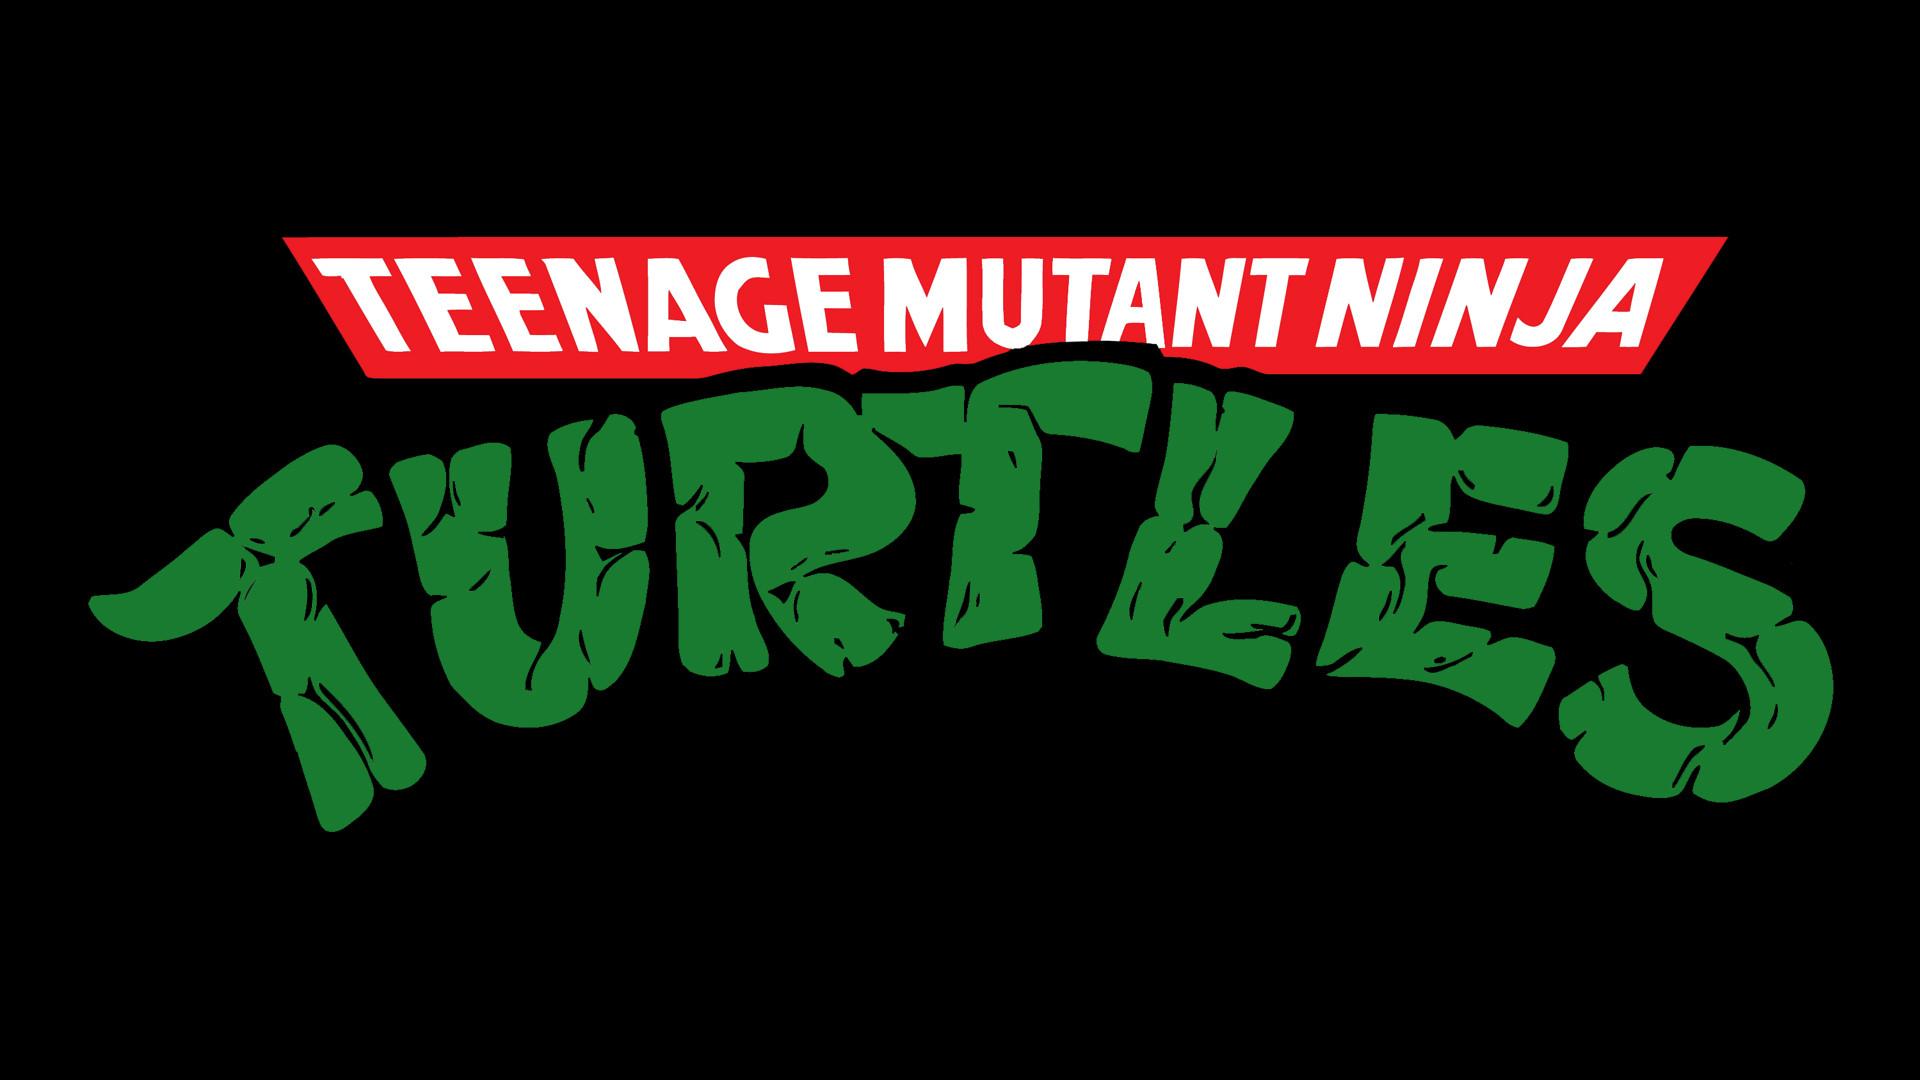 Res: 1920x1080, Teenage Mutant Ninja Turtles Logo Wallpaper